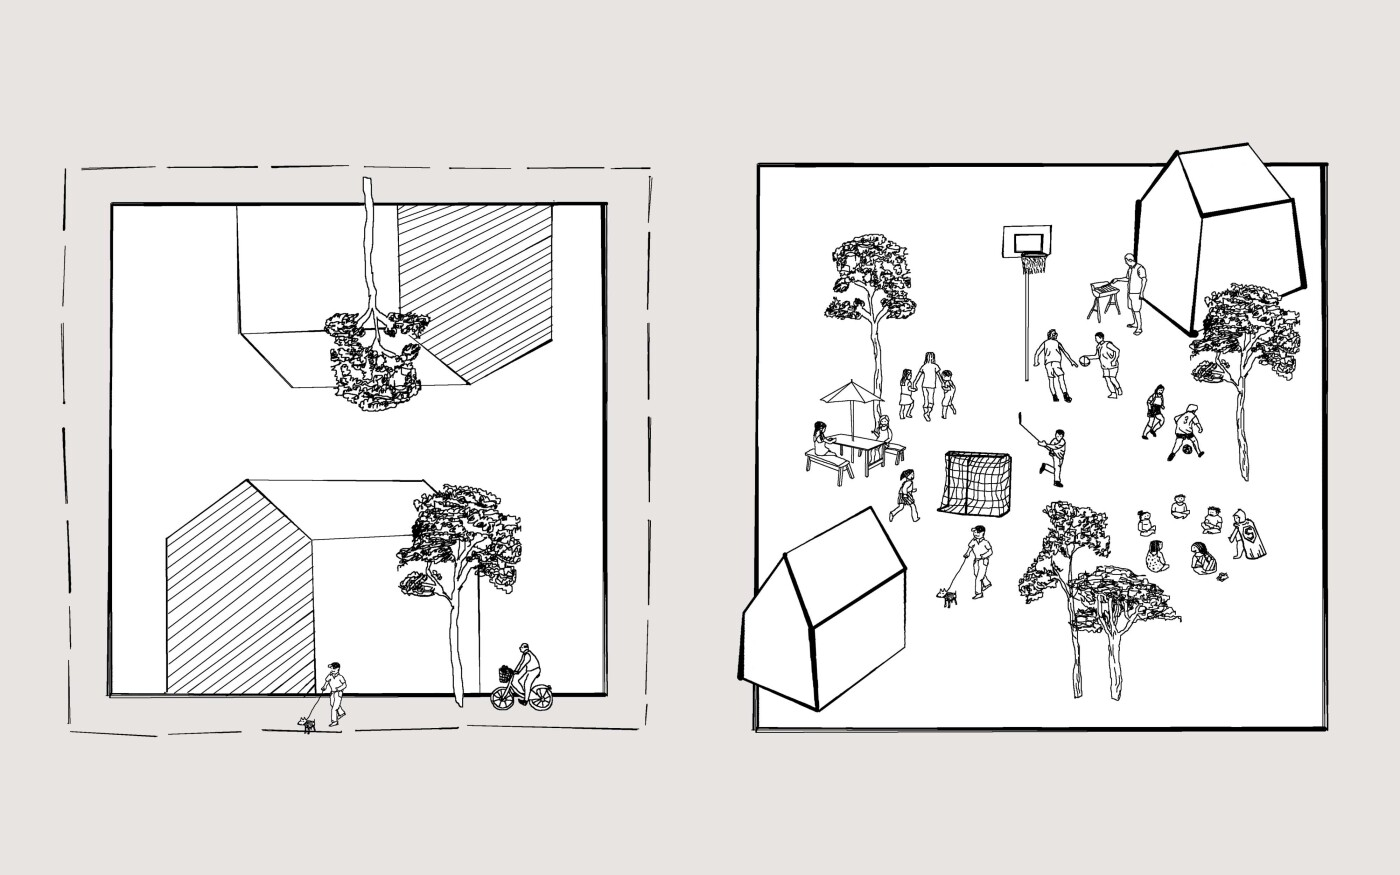 Illustration de l'habitat intermédiaire